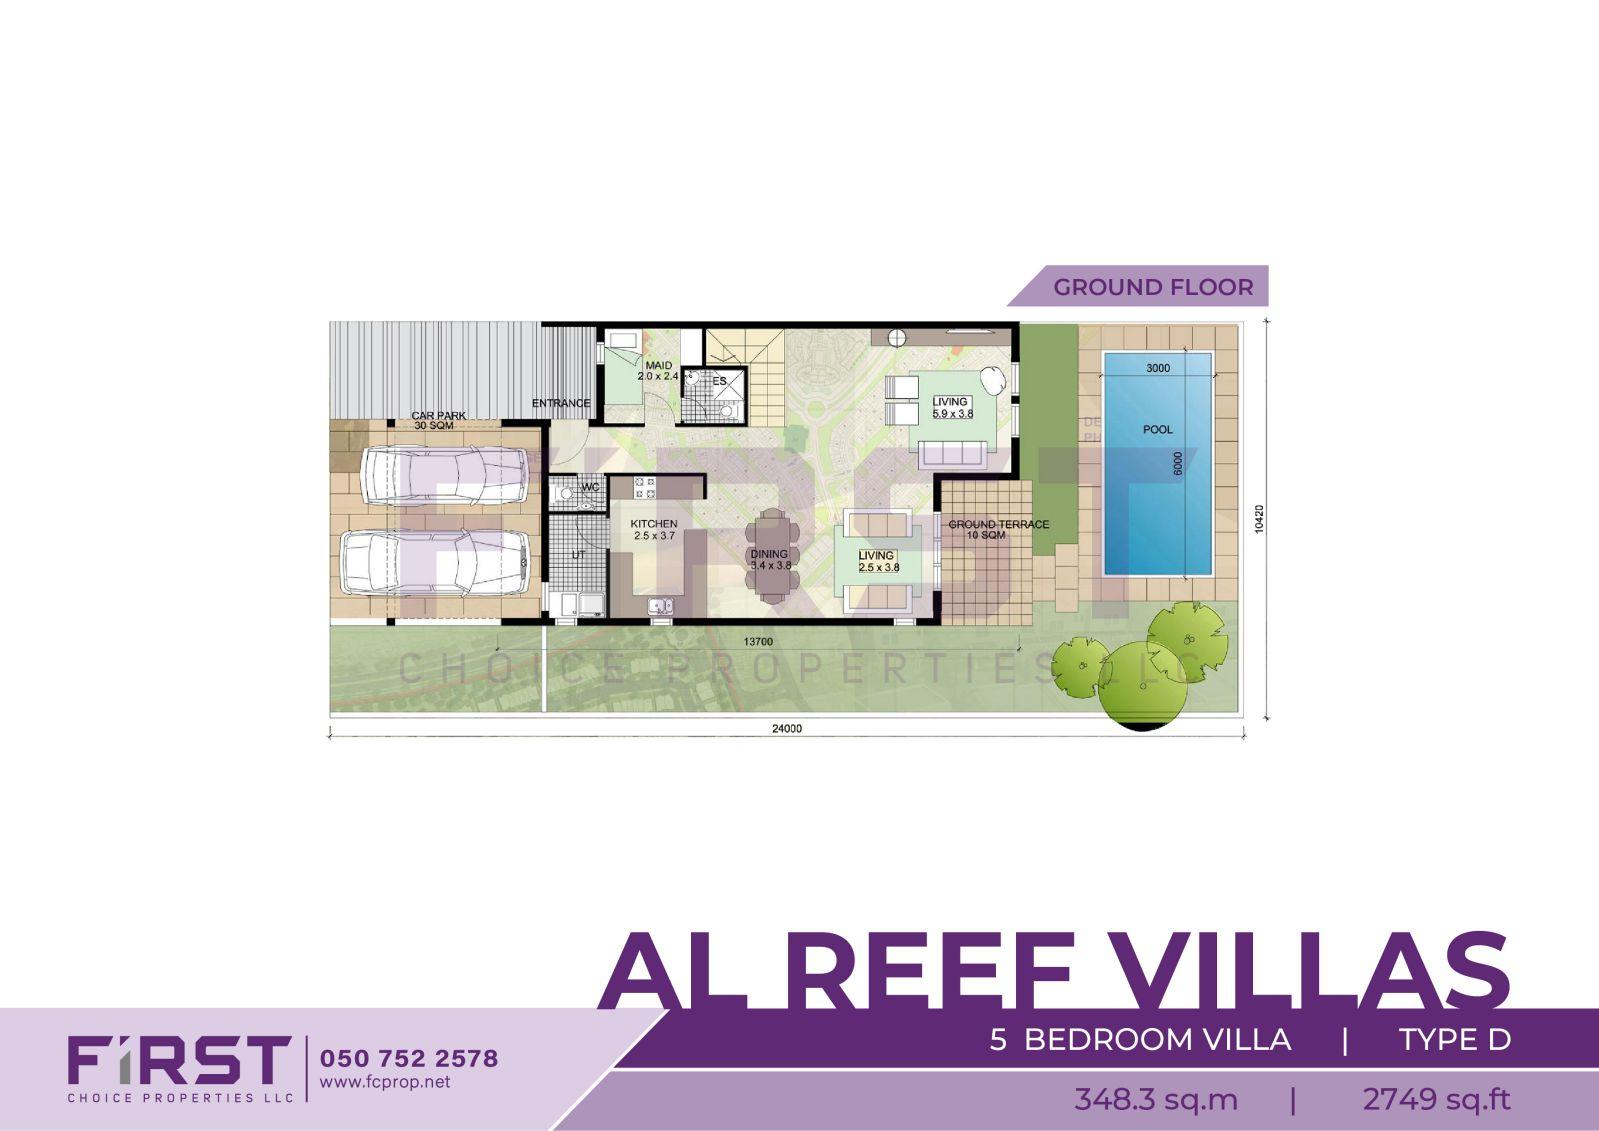 Al Reef Abu Dhabi Al Reef Villas 5 Bedroom Villa Type D 348.3 sq.m 3749 sq.ft 2.jpg